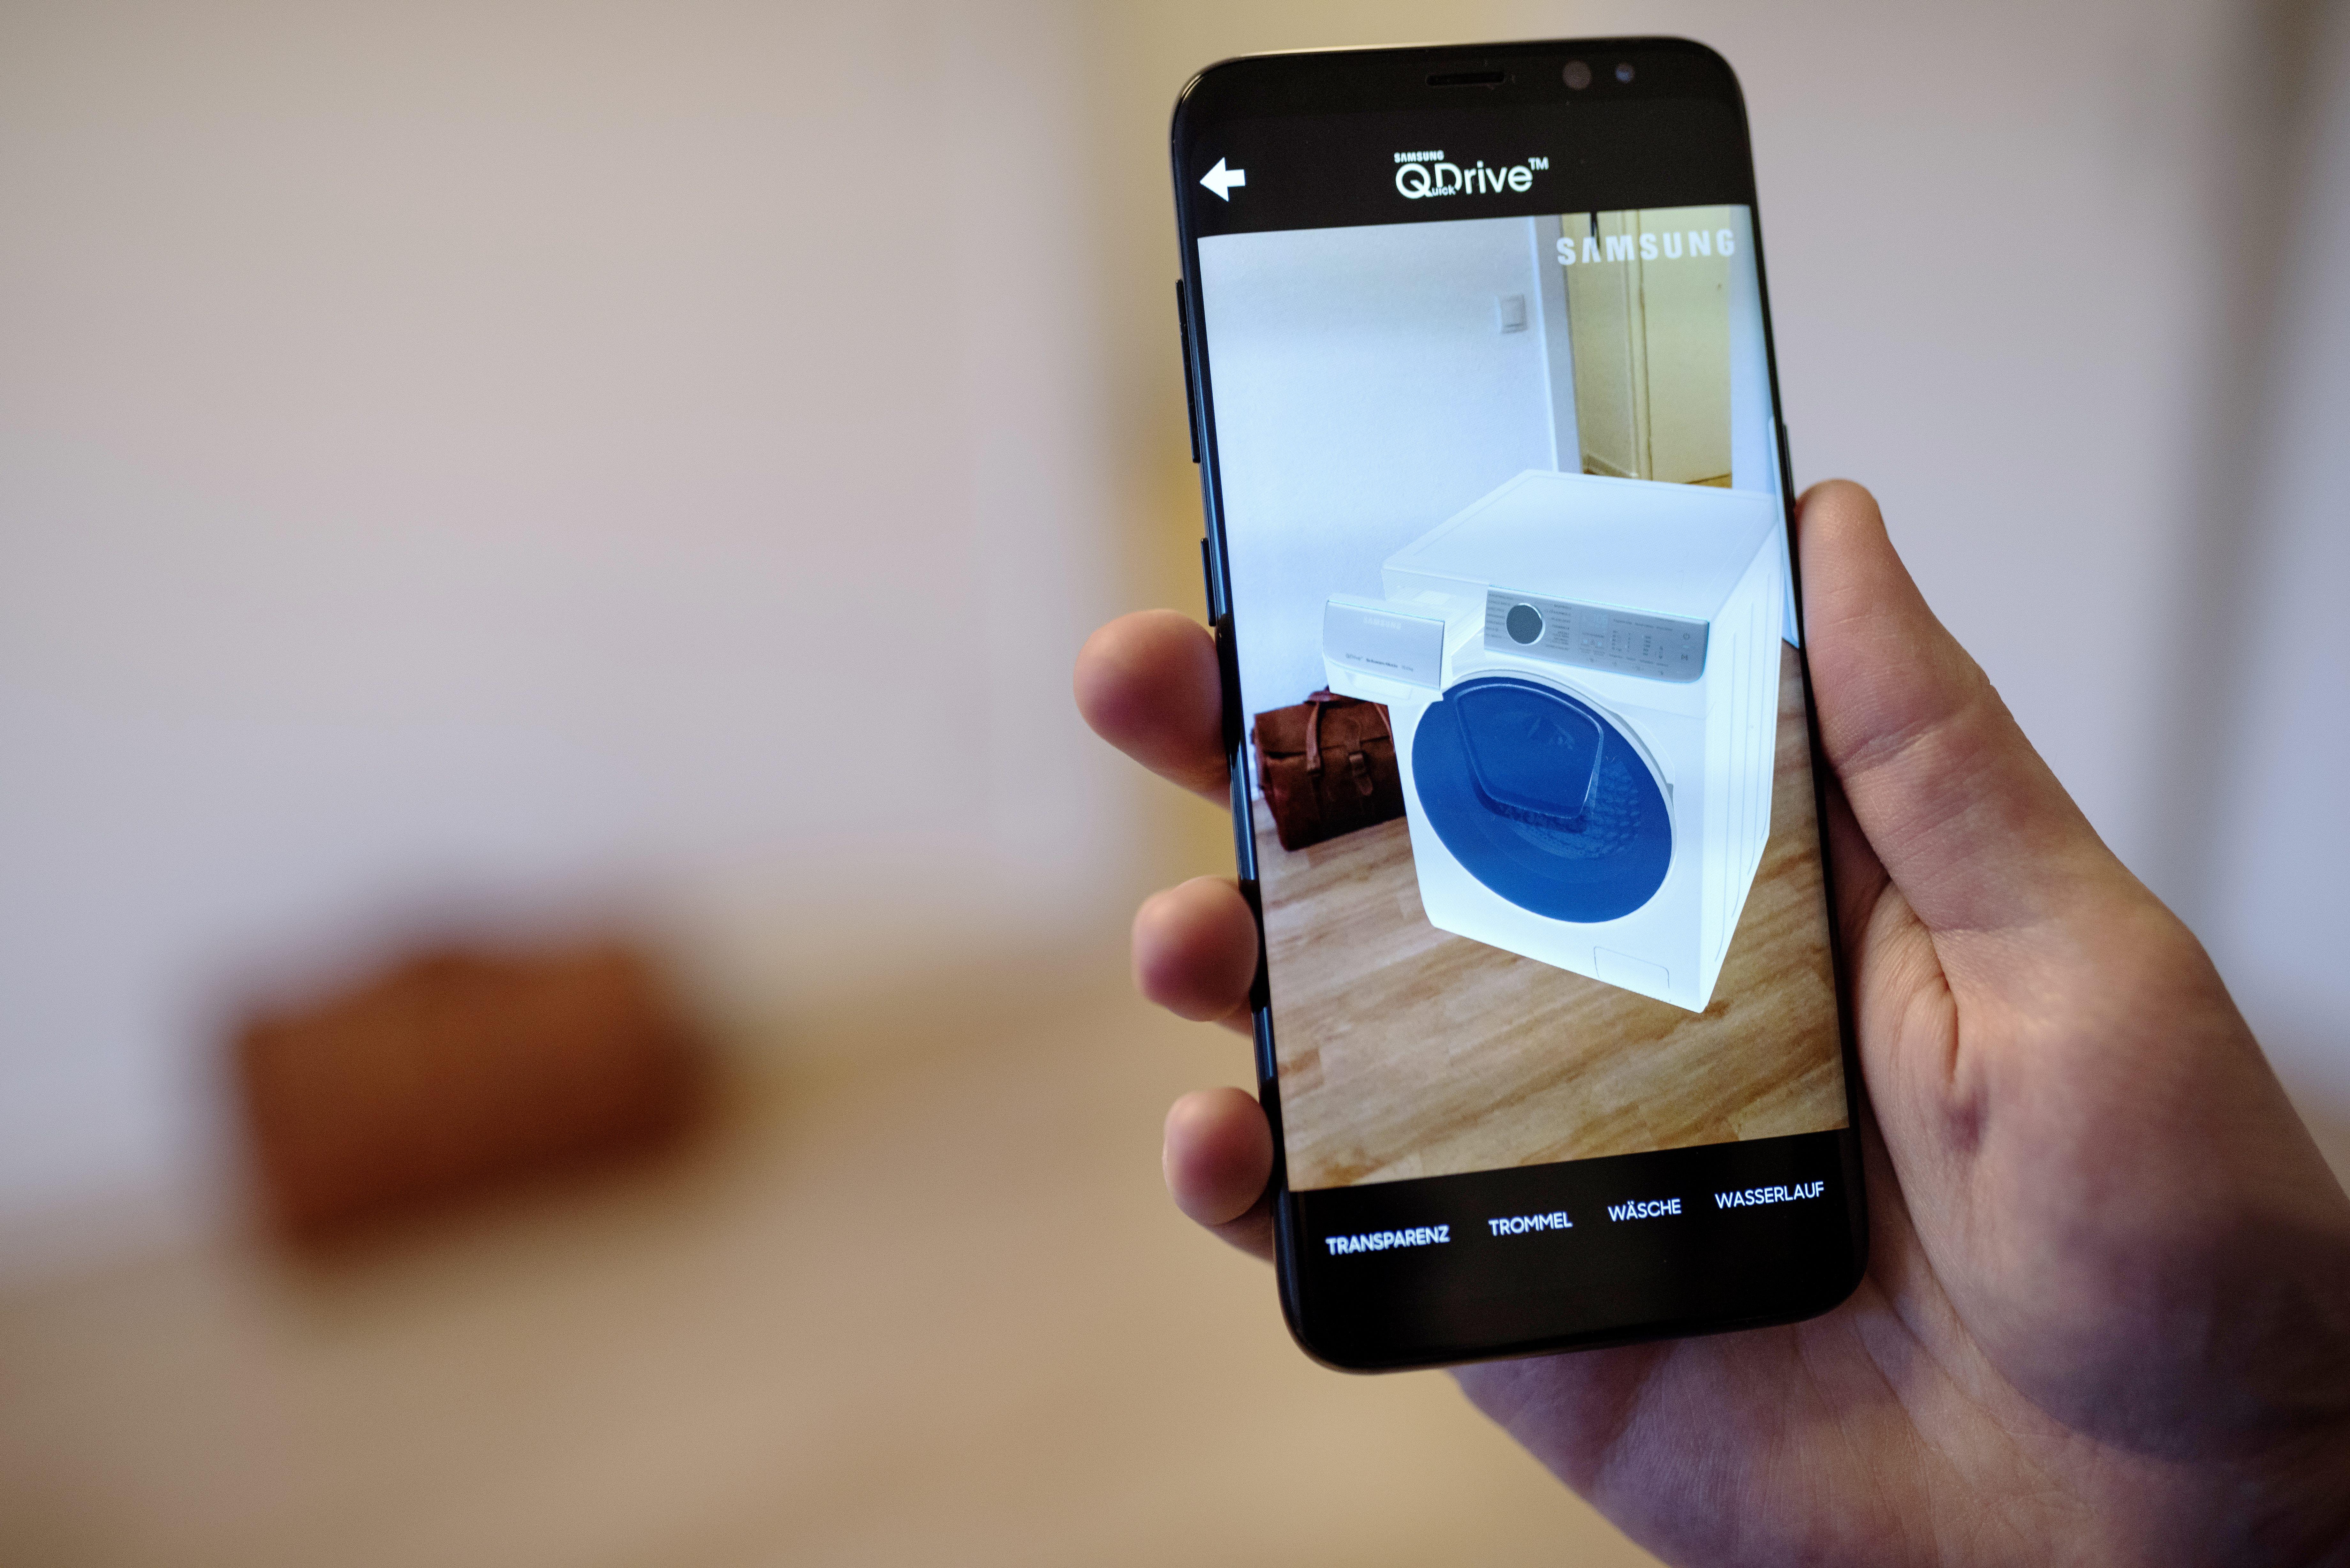 samsung integriert augmented reality in trainingsma nahmen. Black Bedroom Furniture Sets. Home Design Ideas